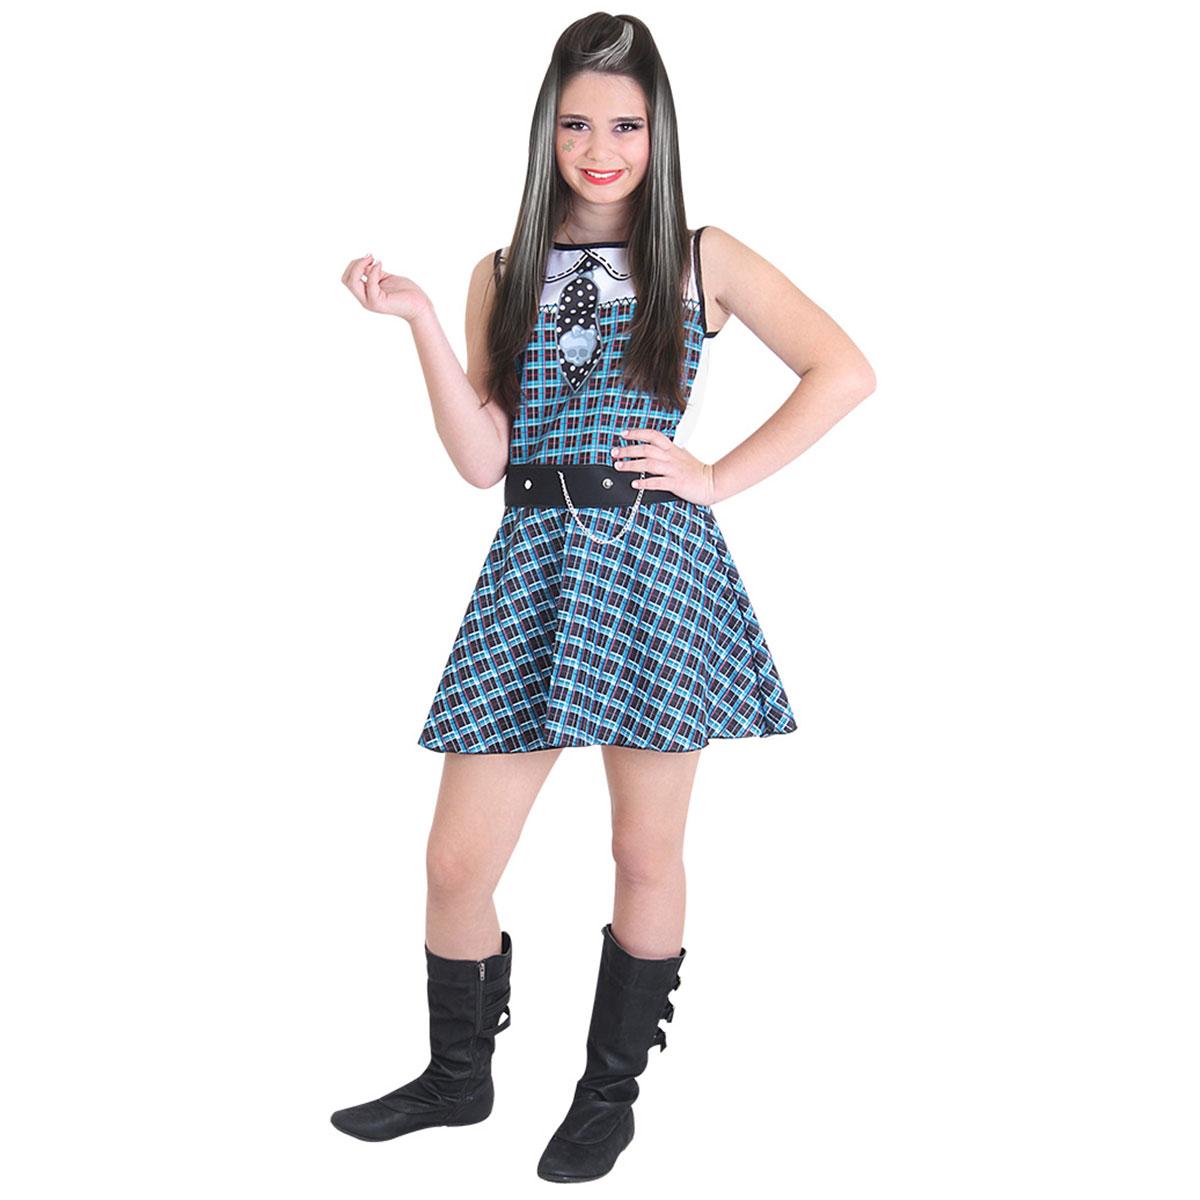 c18c36a81106c Fantasia Monster High - Frankie Pop